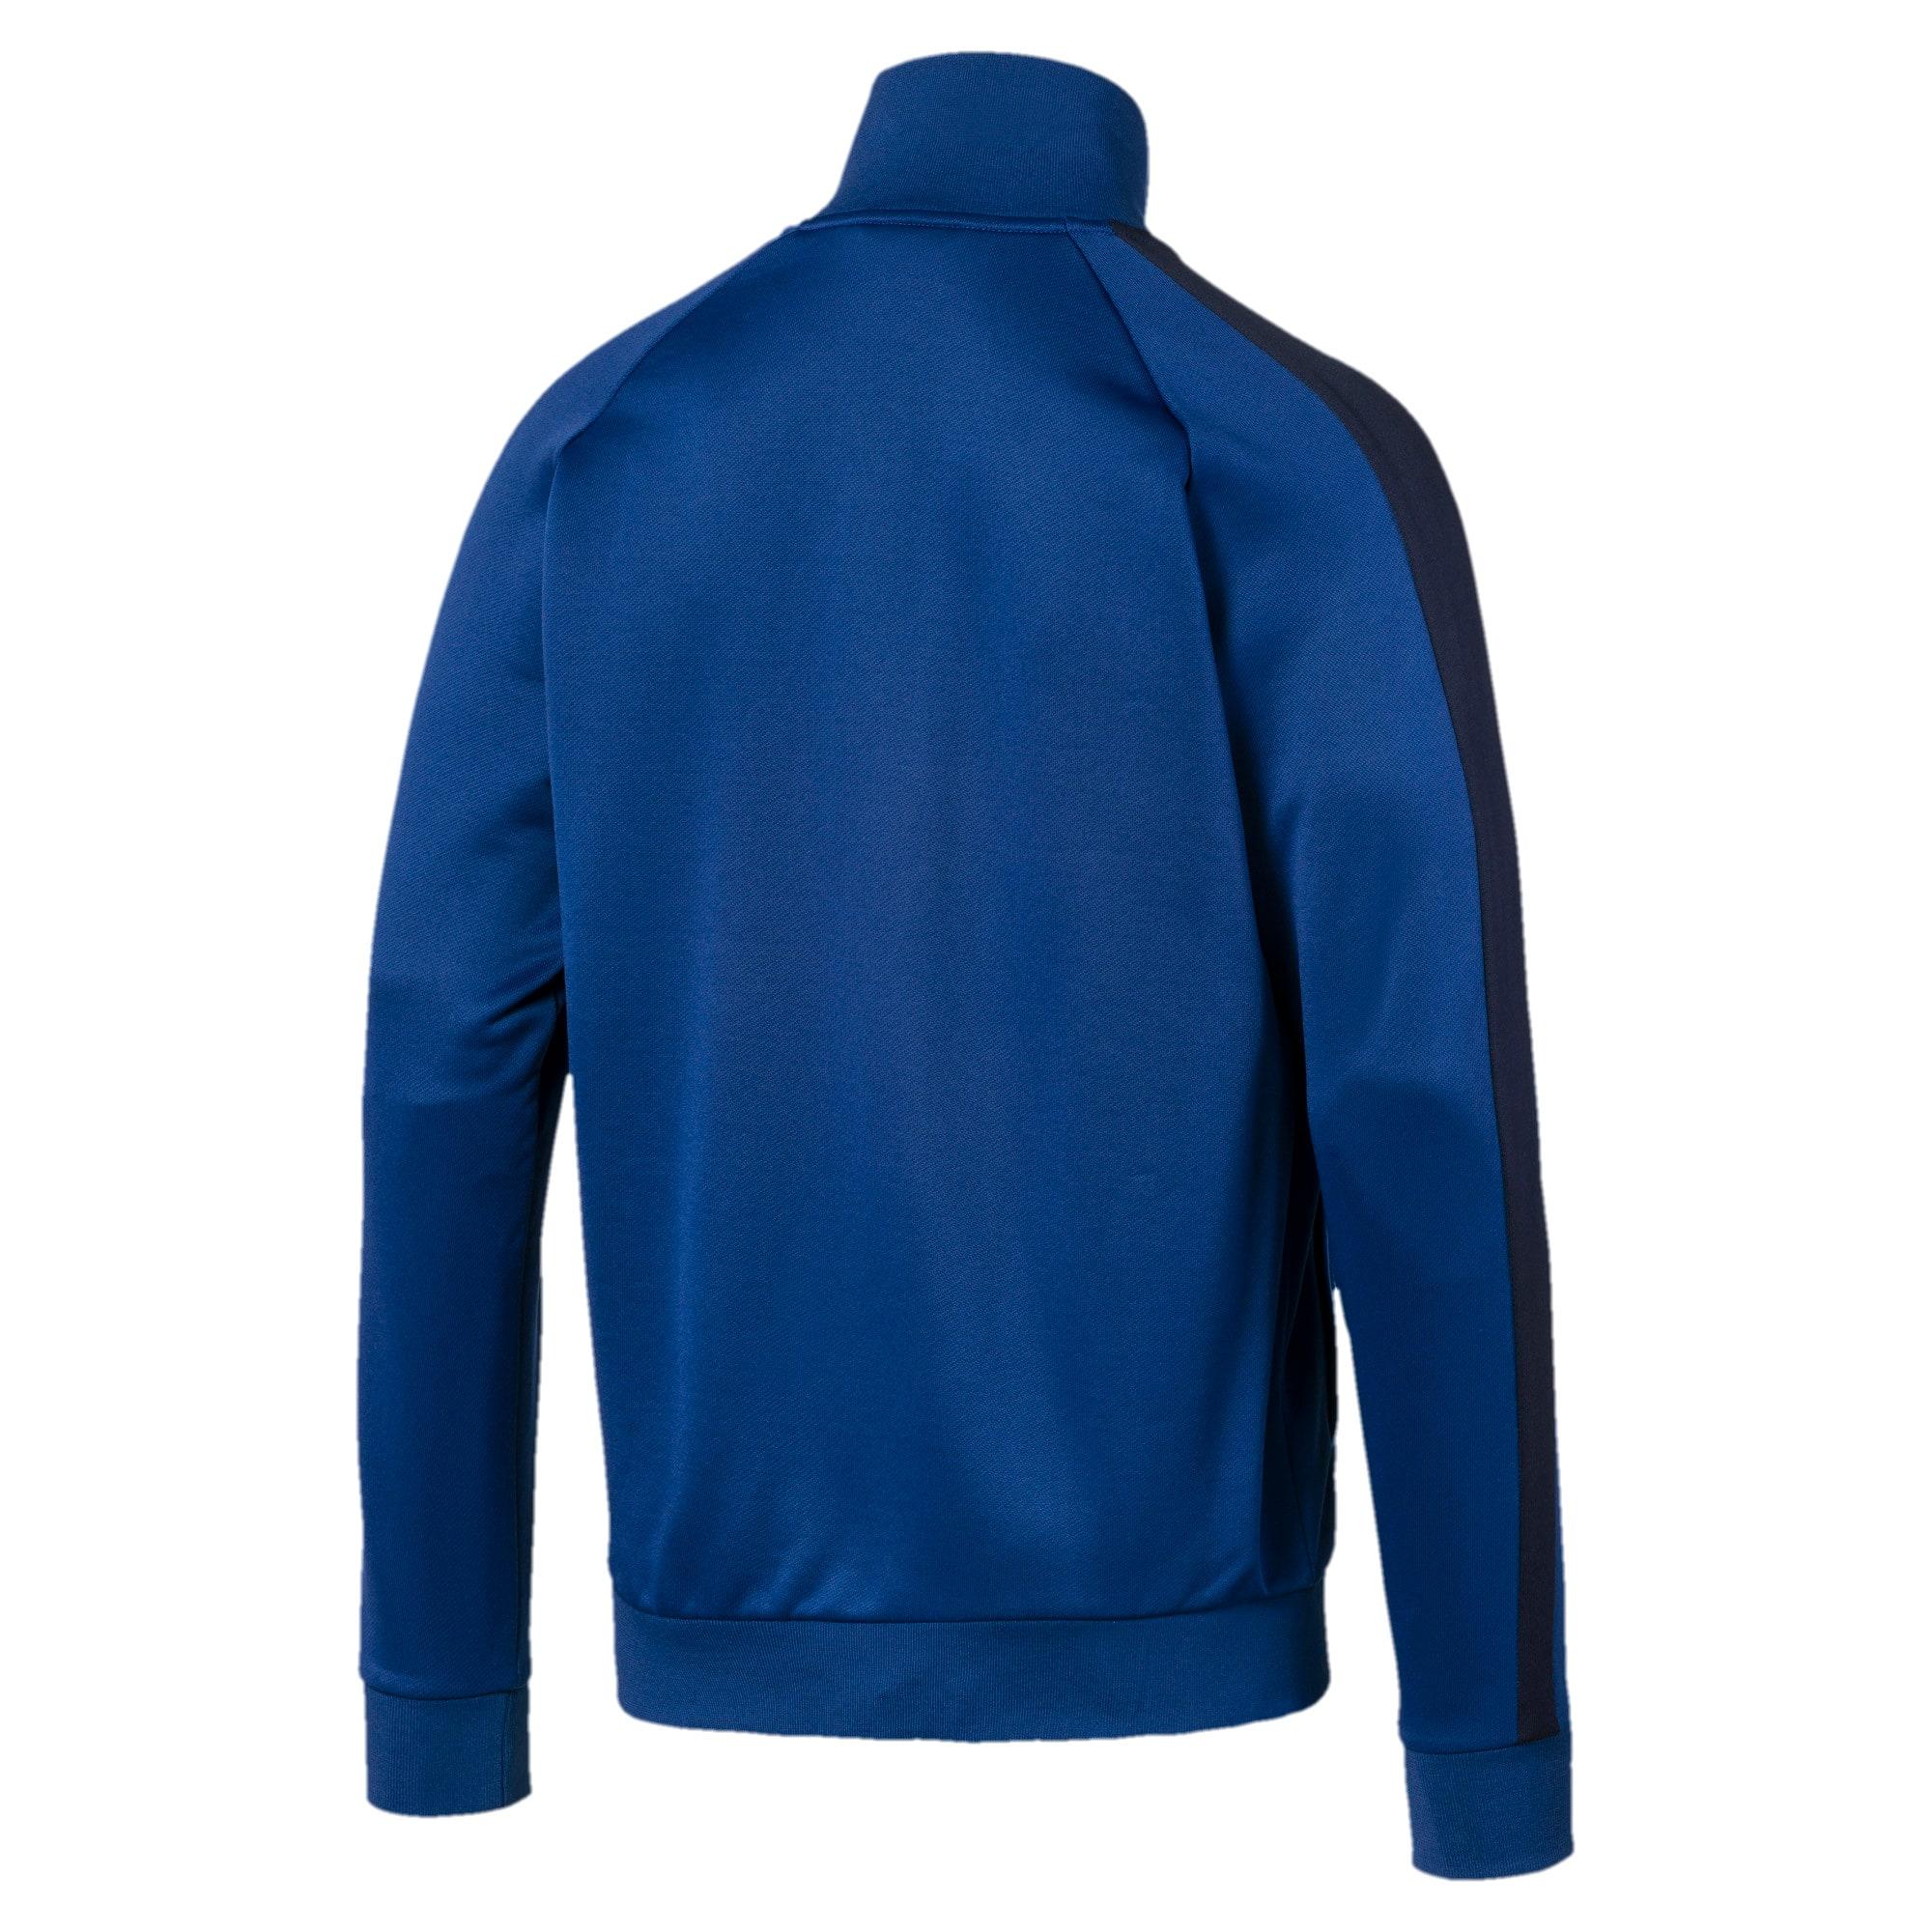 Thumbnail 5 of Iconic T7 Men's Track Jacket, Galaxy Blue, medium